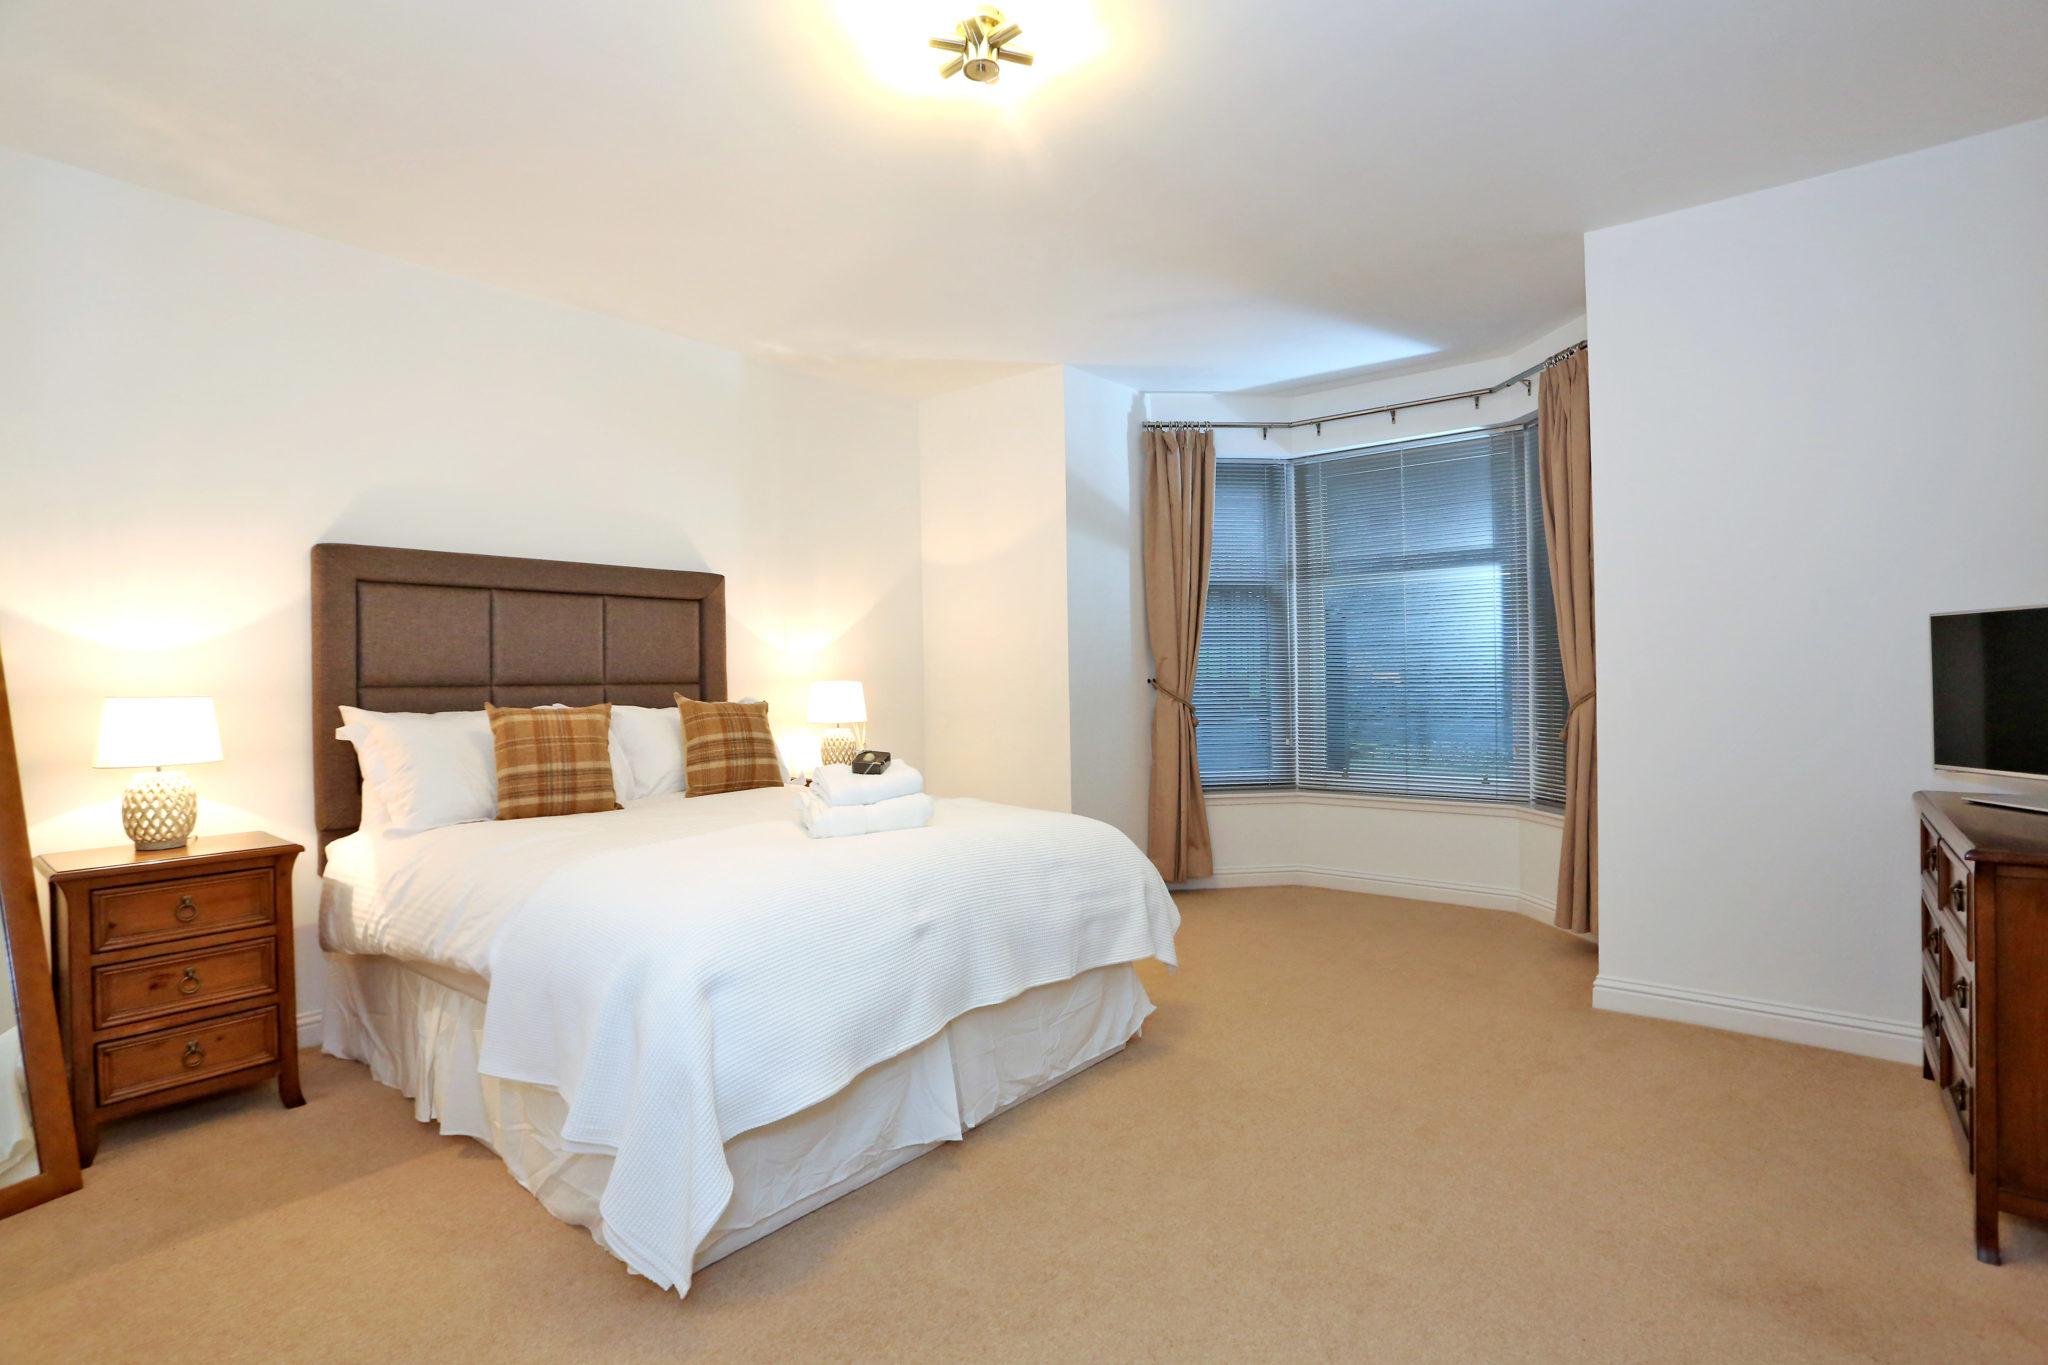 Cheap-Accommodation-Aberdeen---Queen's-Road-Apartments-Near-Hazelhead-Park---Urban-Stay-5